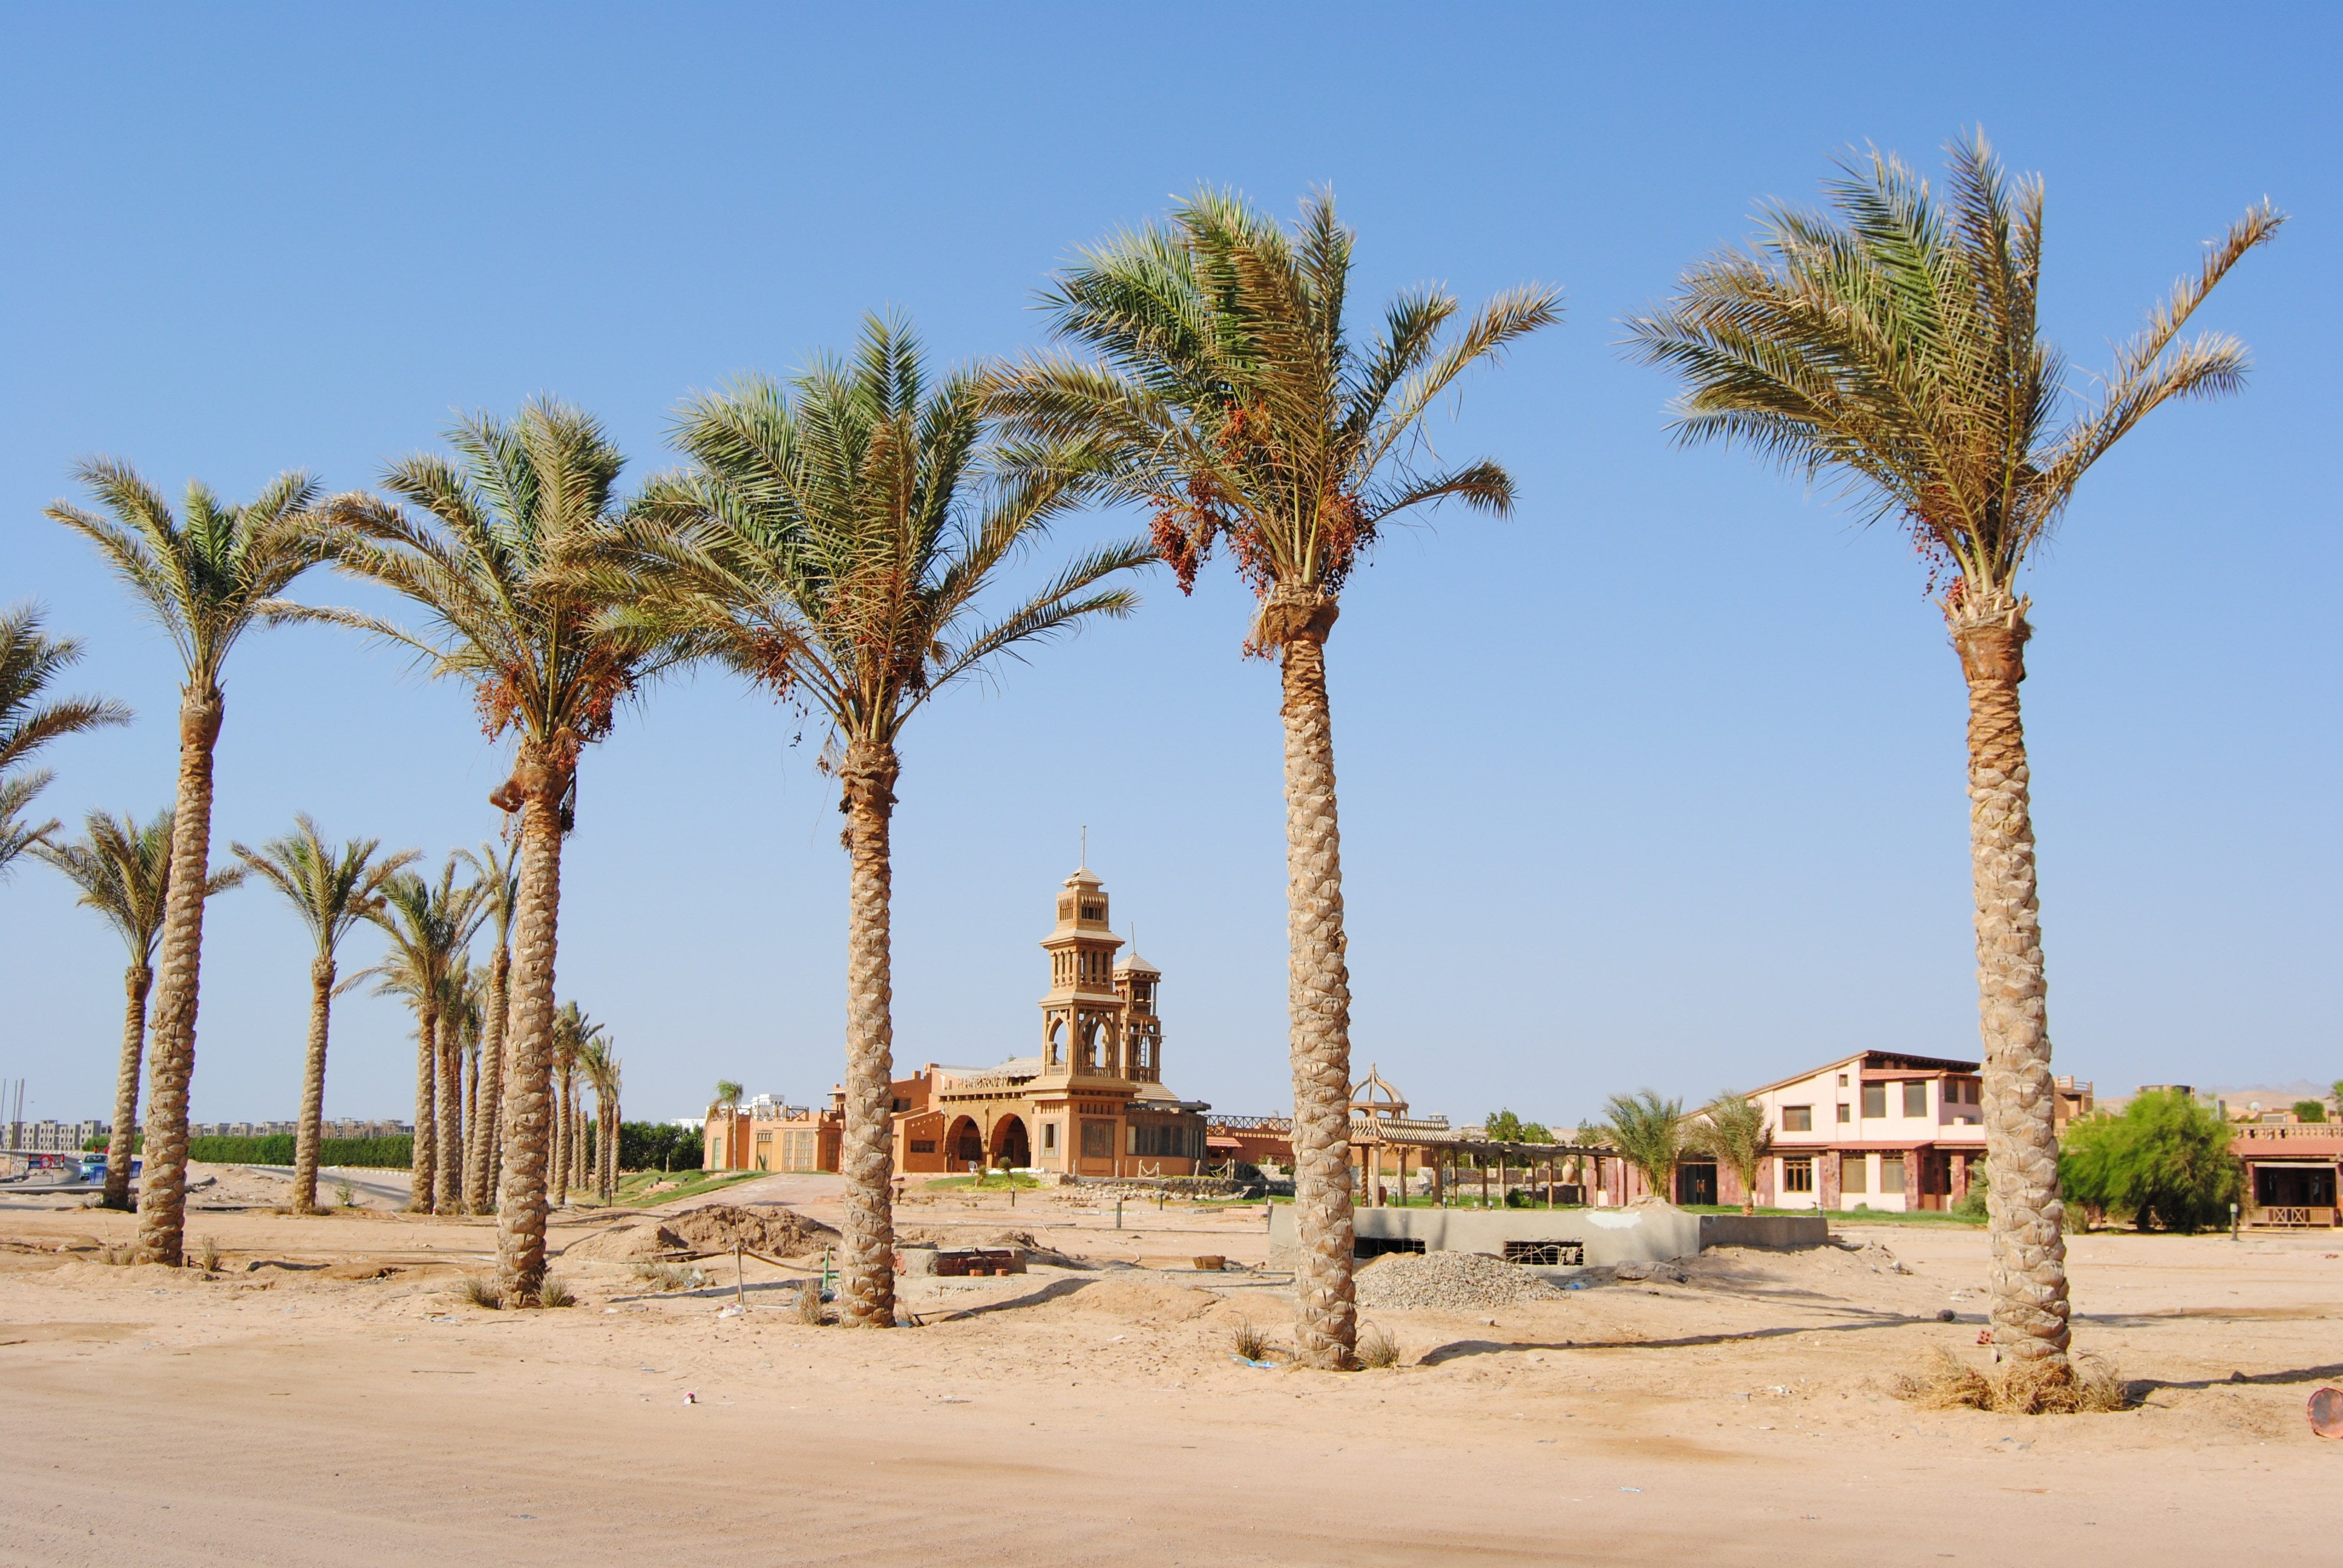 jeep safari in the desert _ Egypt